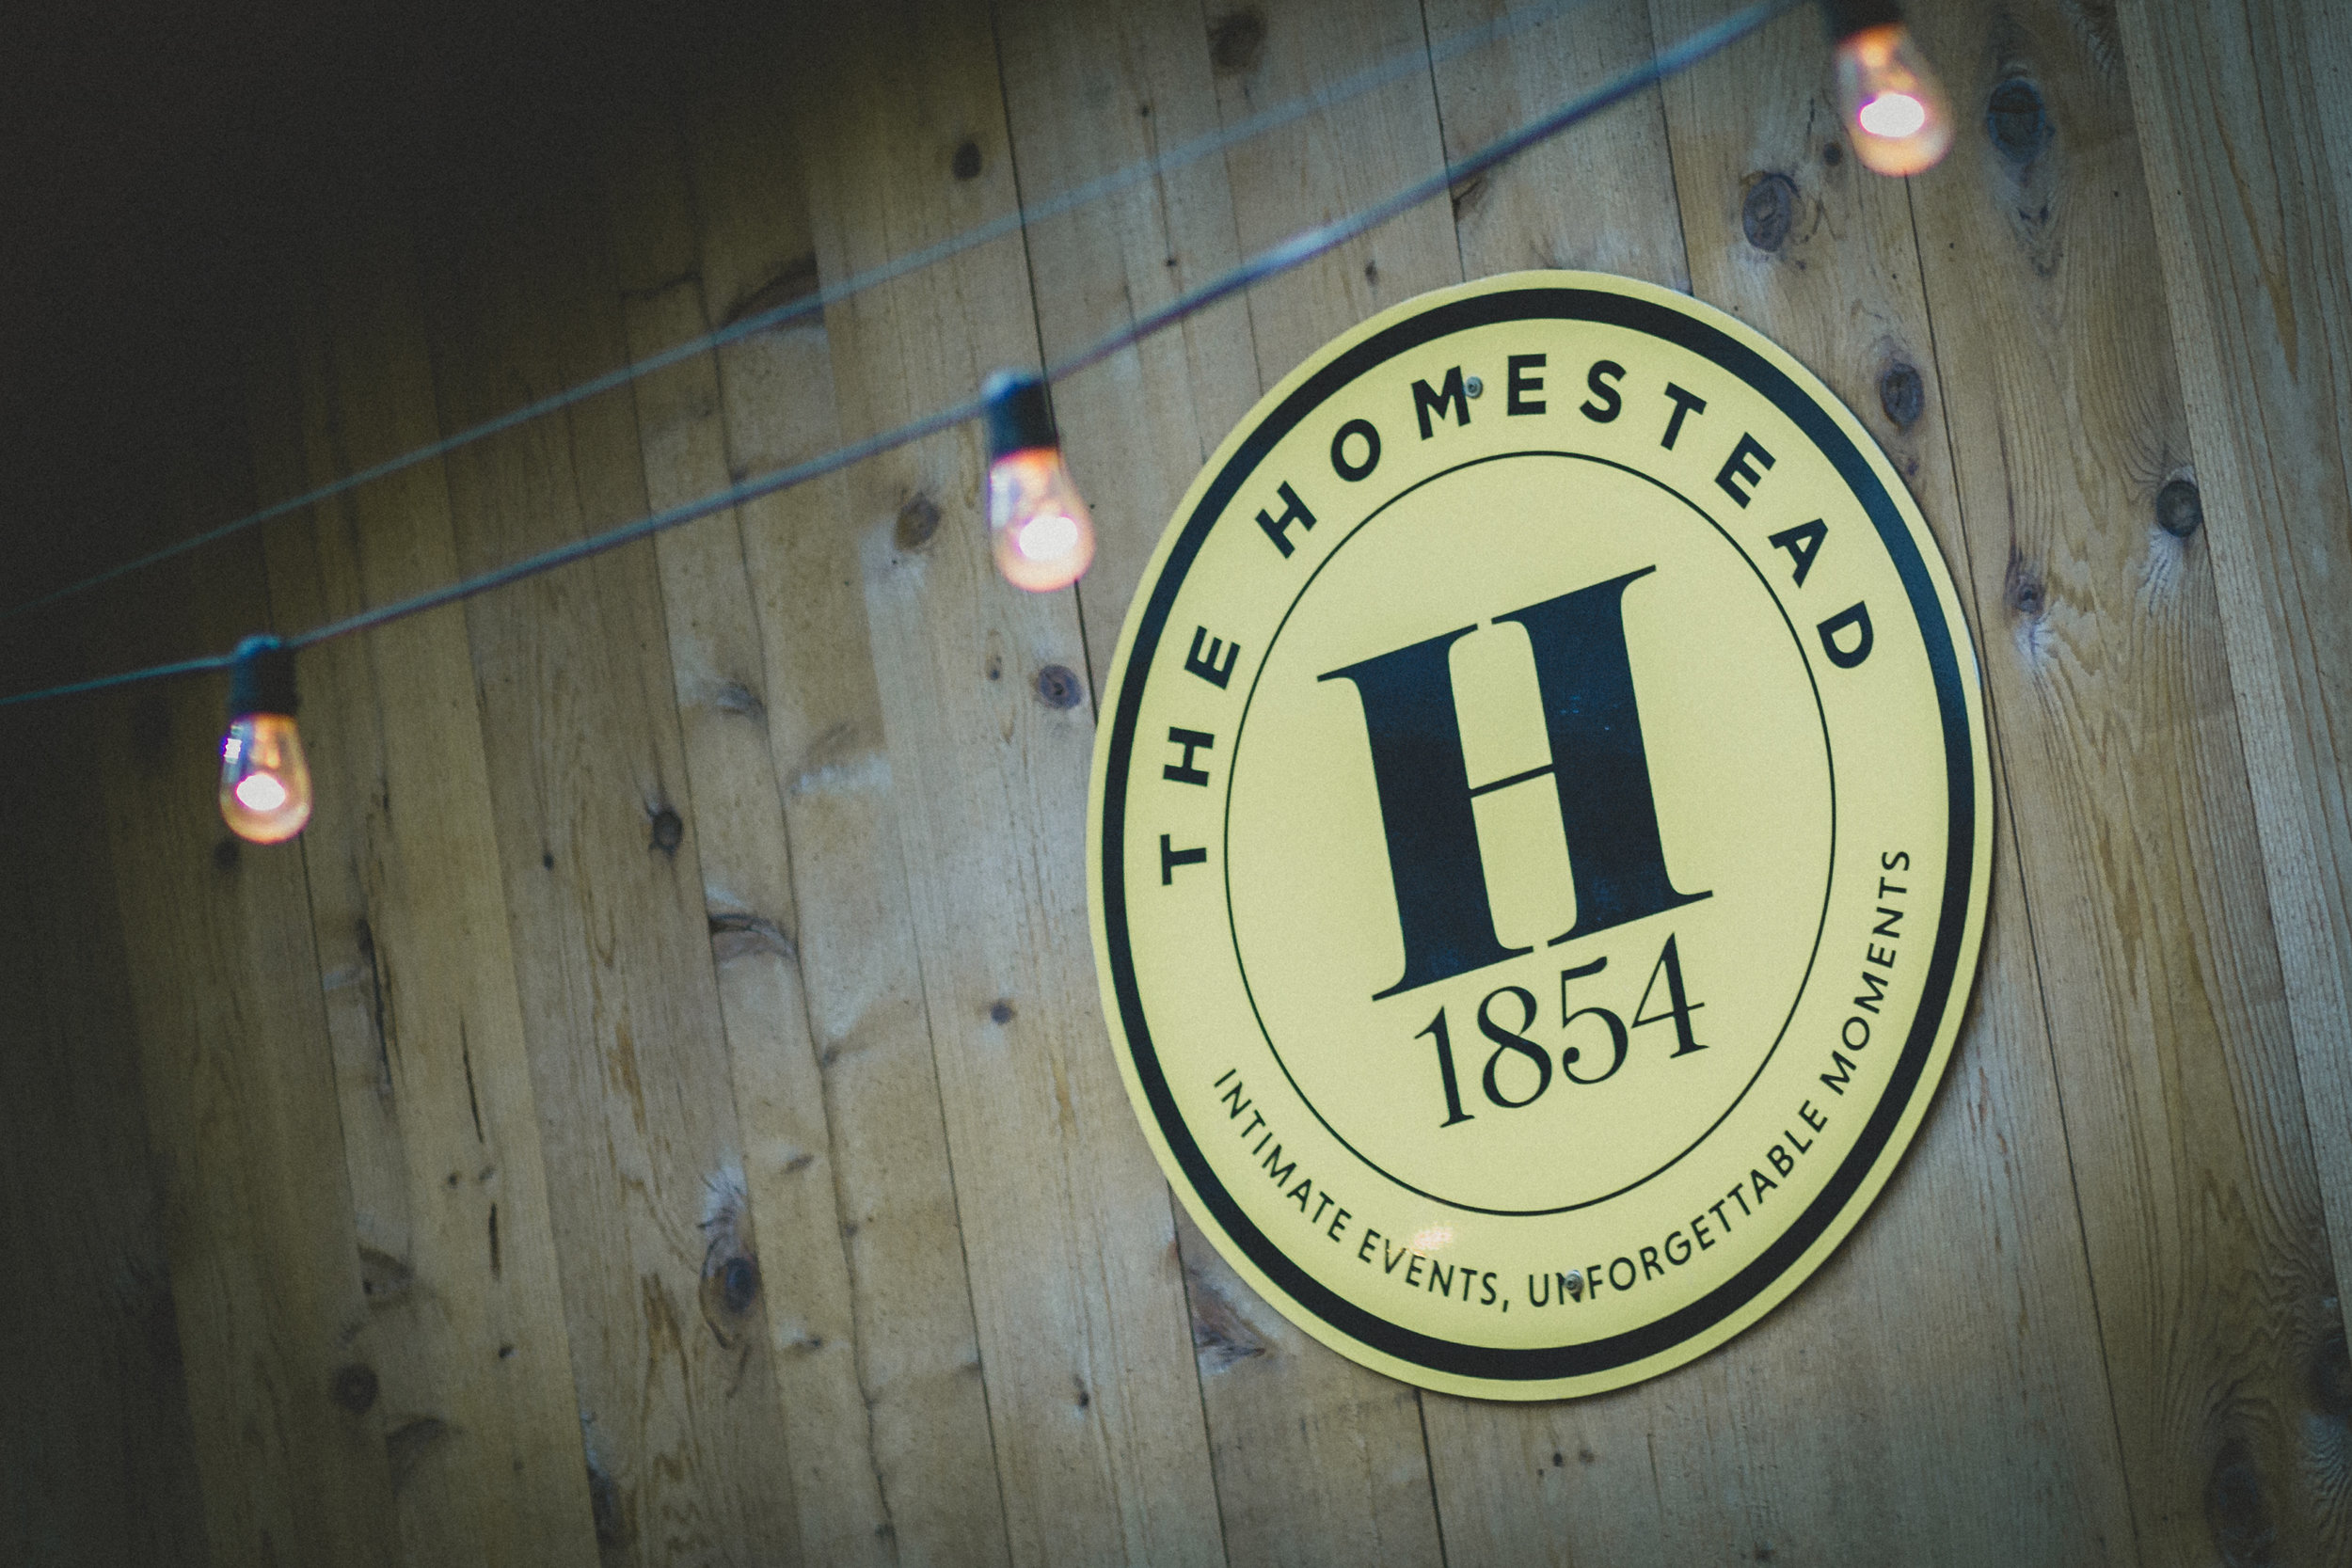 LSS HOMESTEAD 1854-19